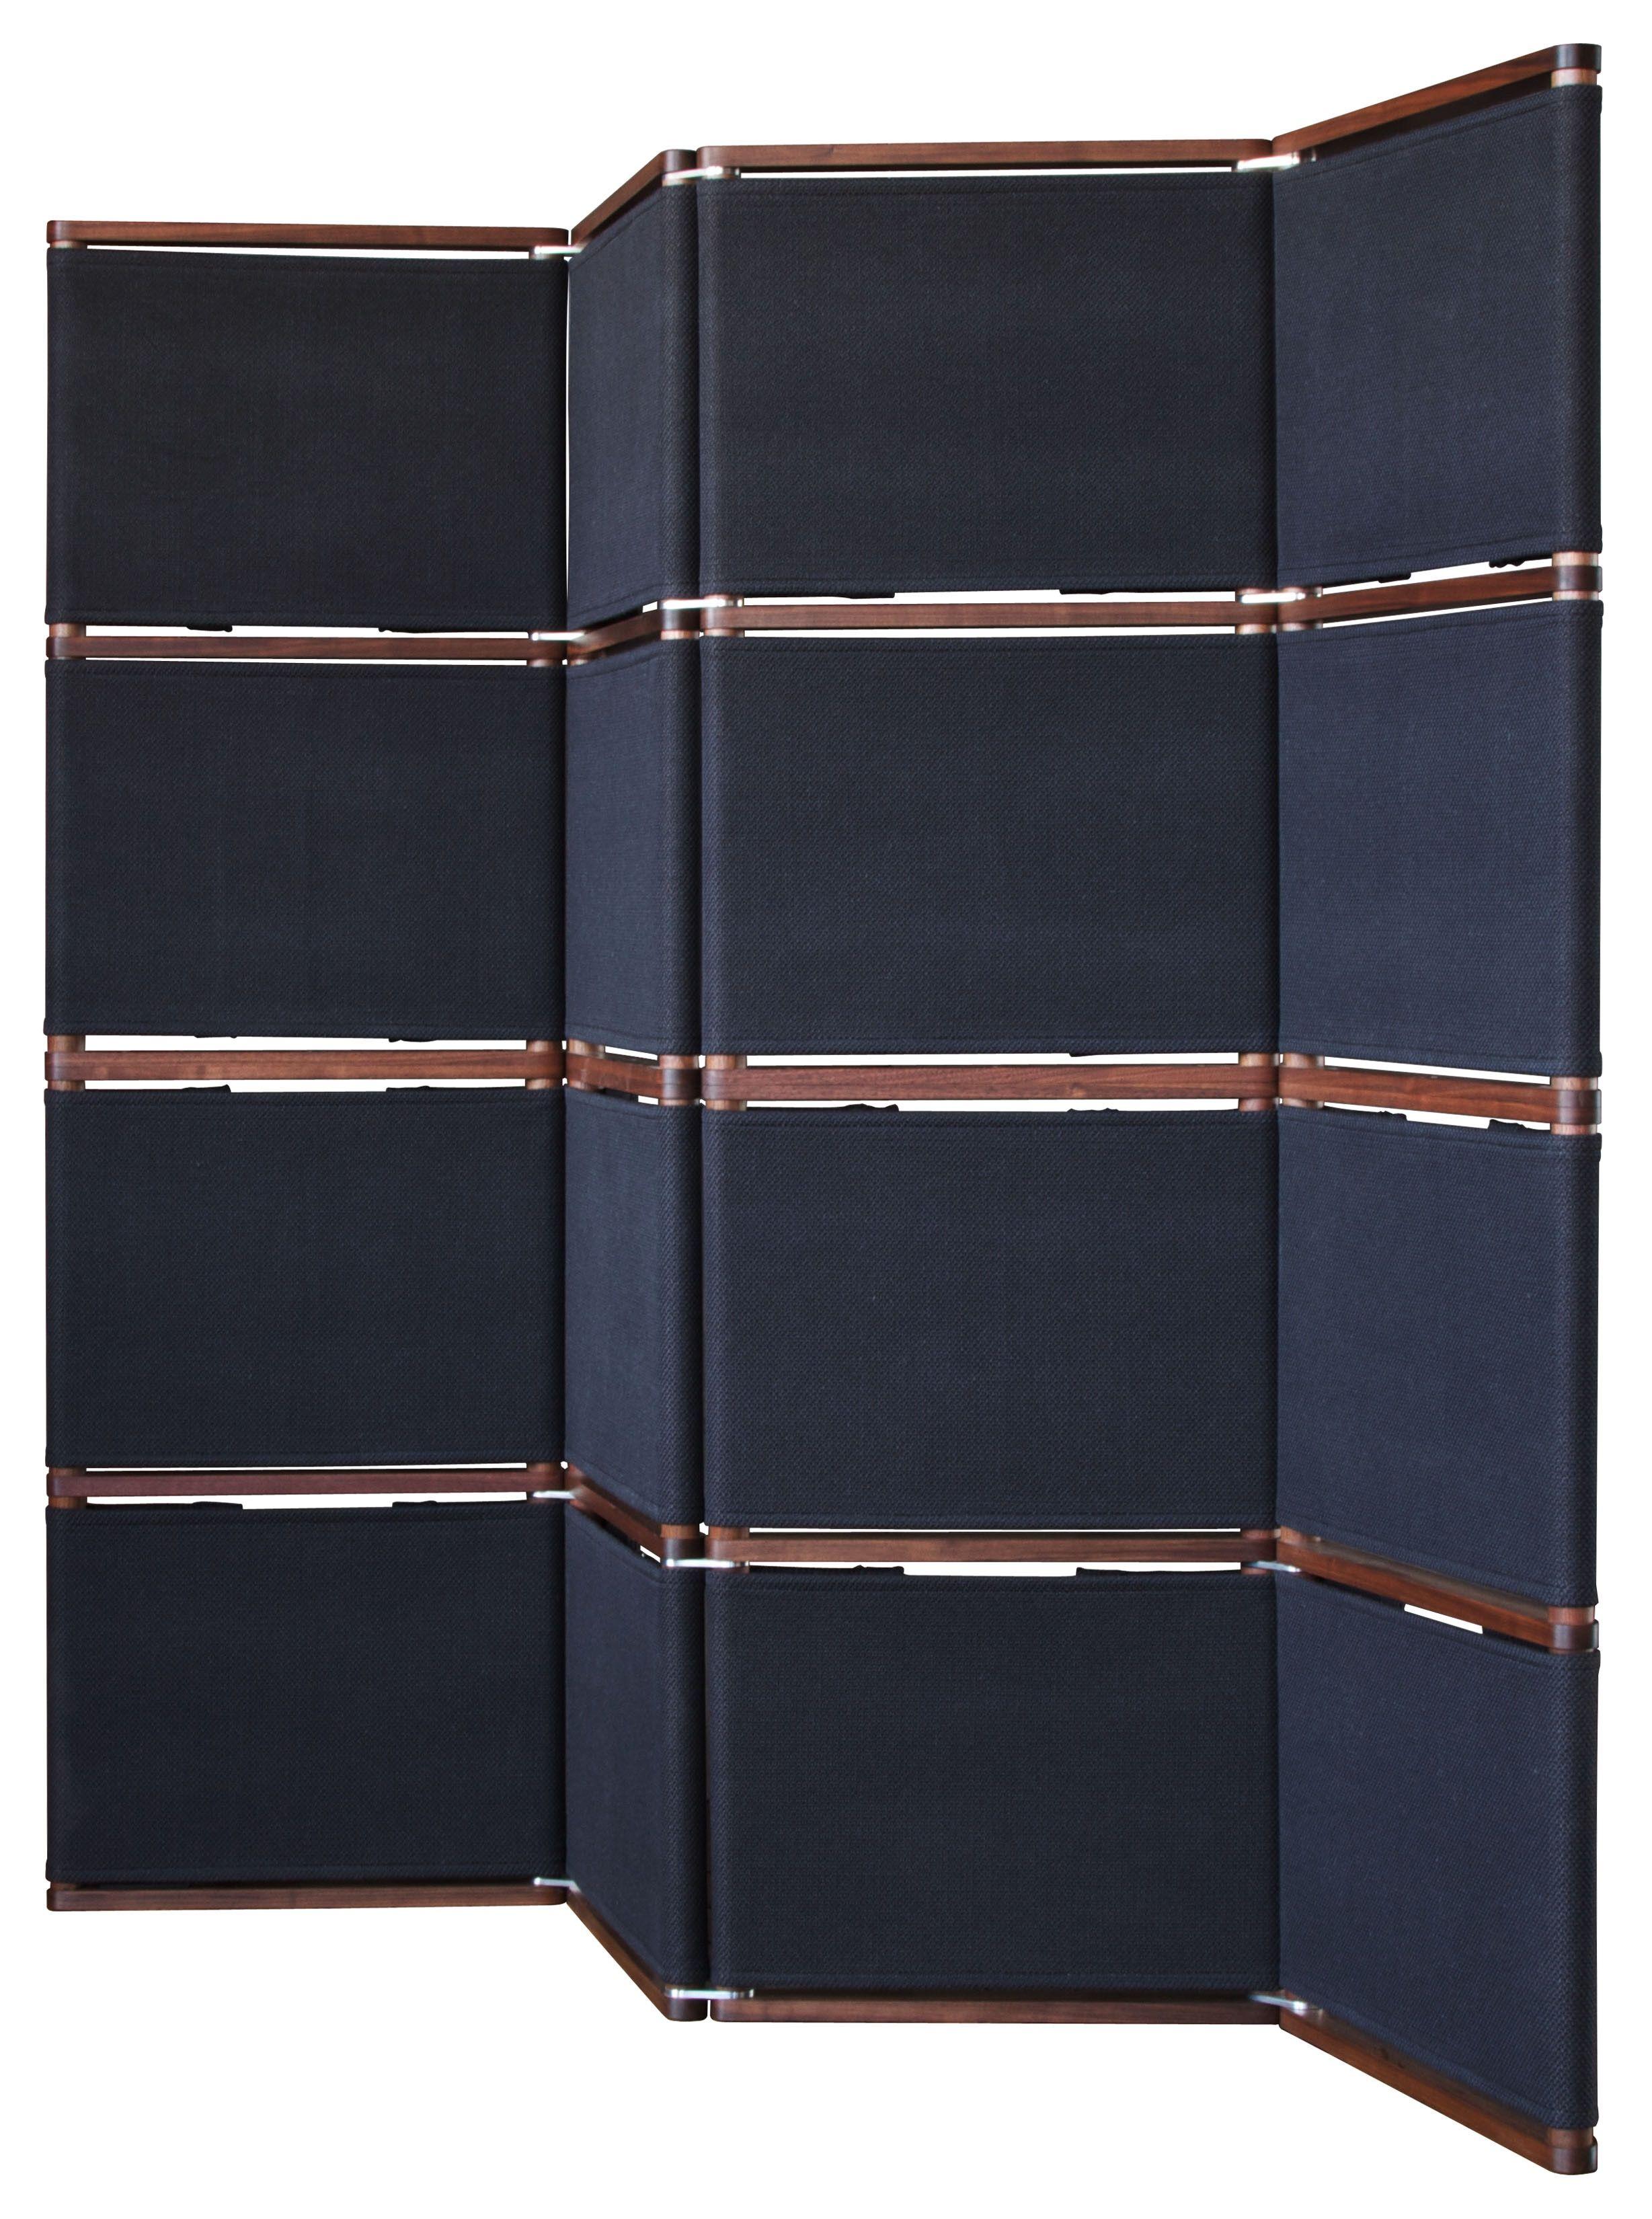 lambert folding screen  traditional uxui designer and folding  - lambert folding screen